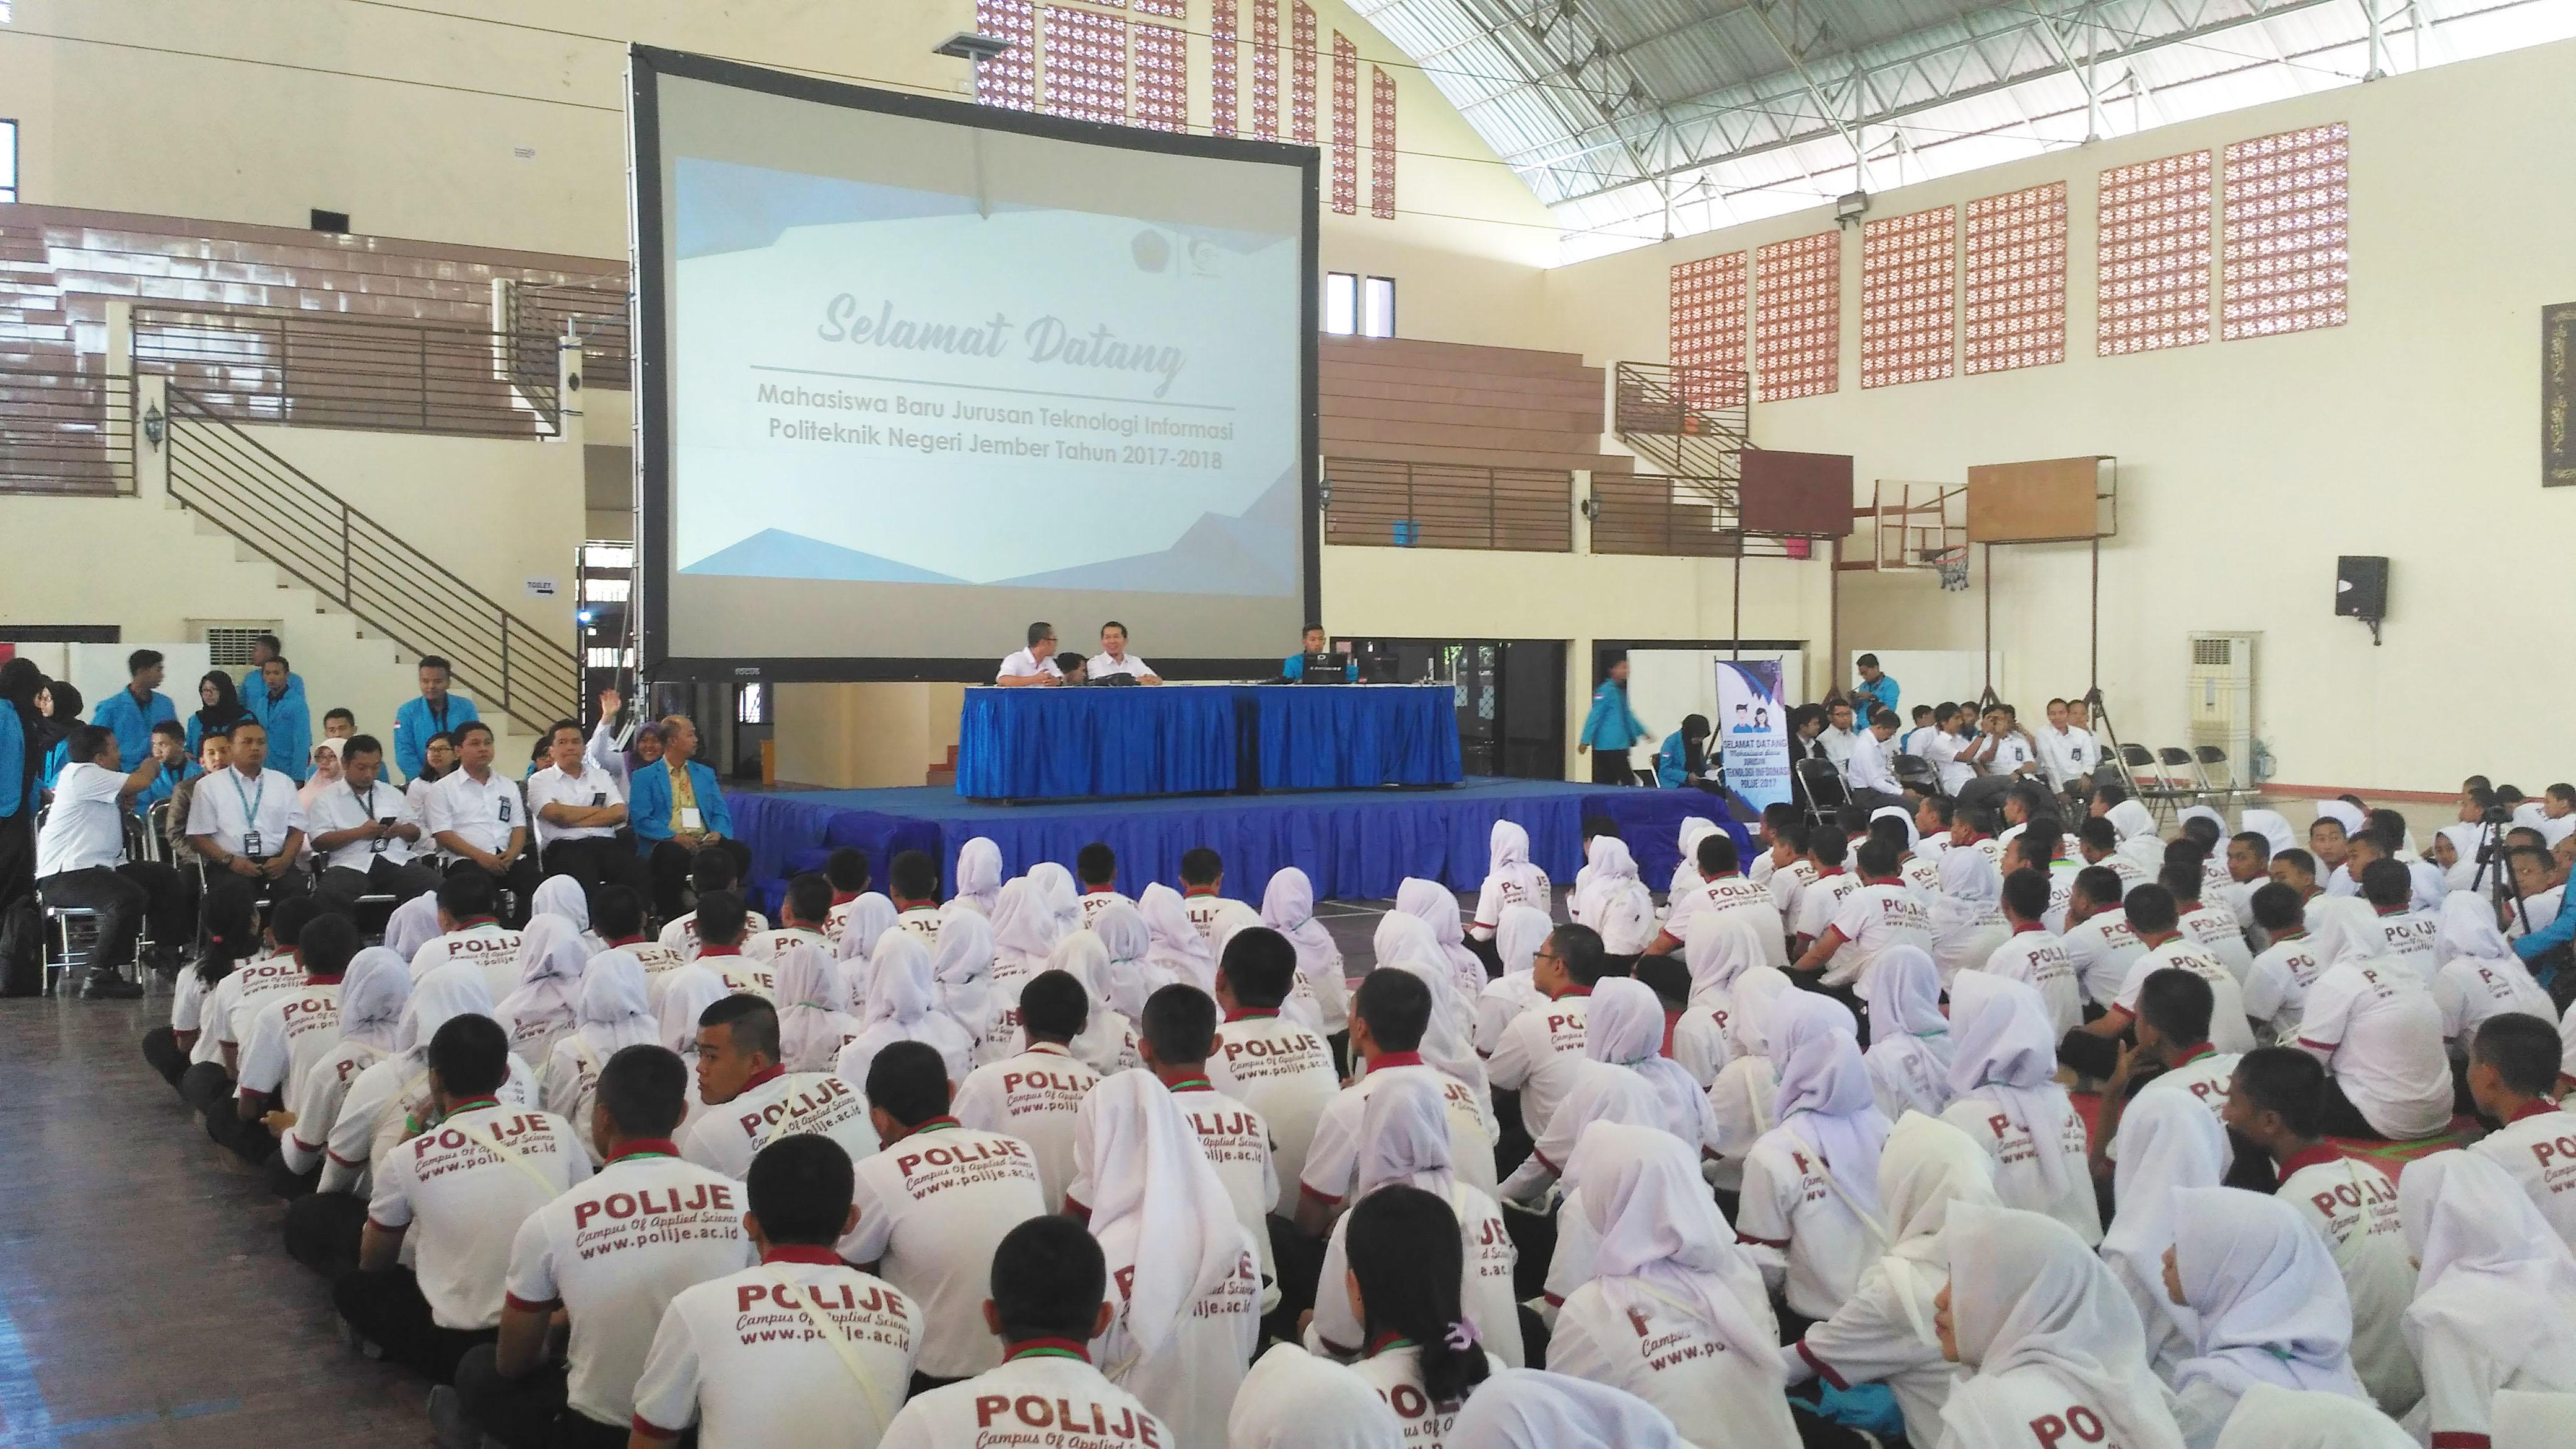 Kegiatan Pengenalan Kampus Mahasiswa Jurusan Teknologi Informasi